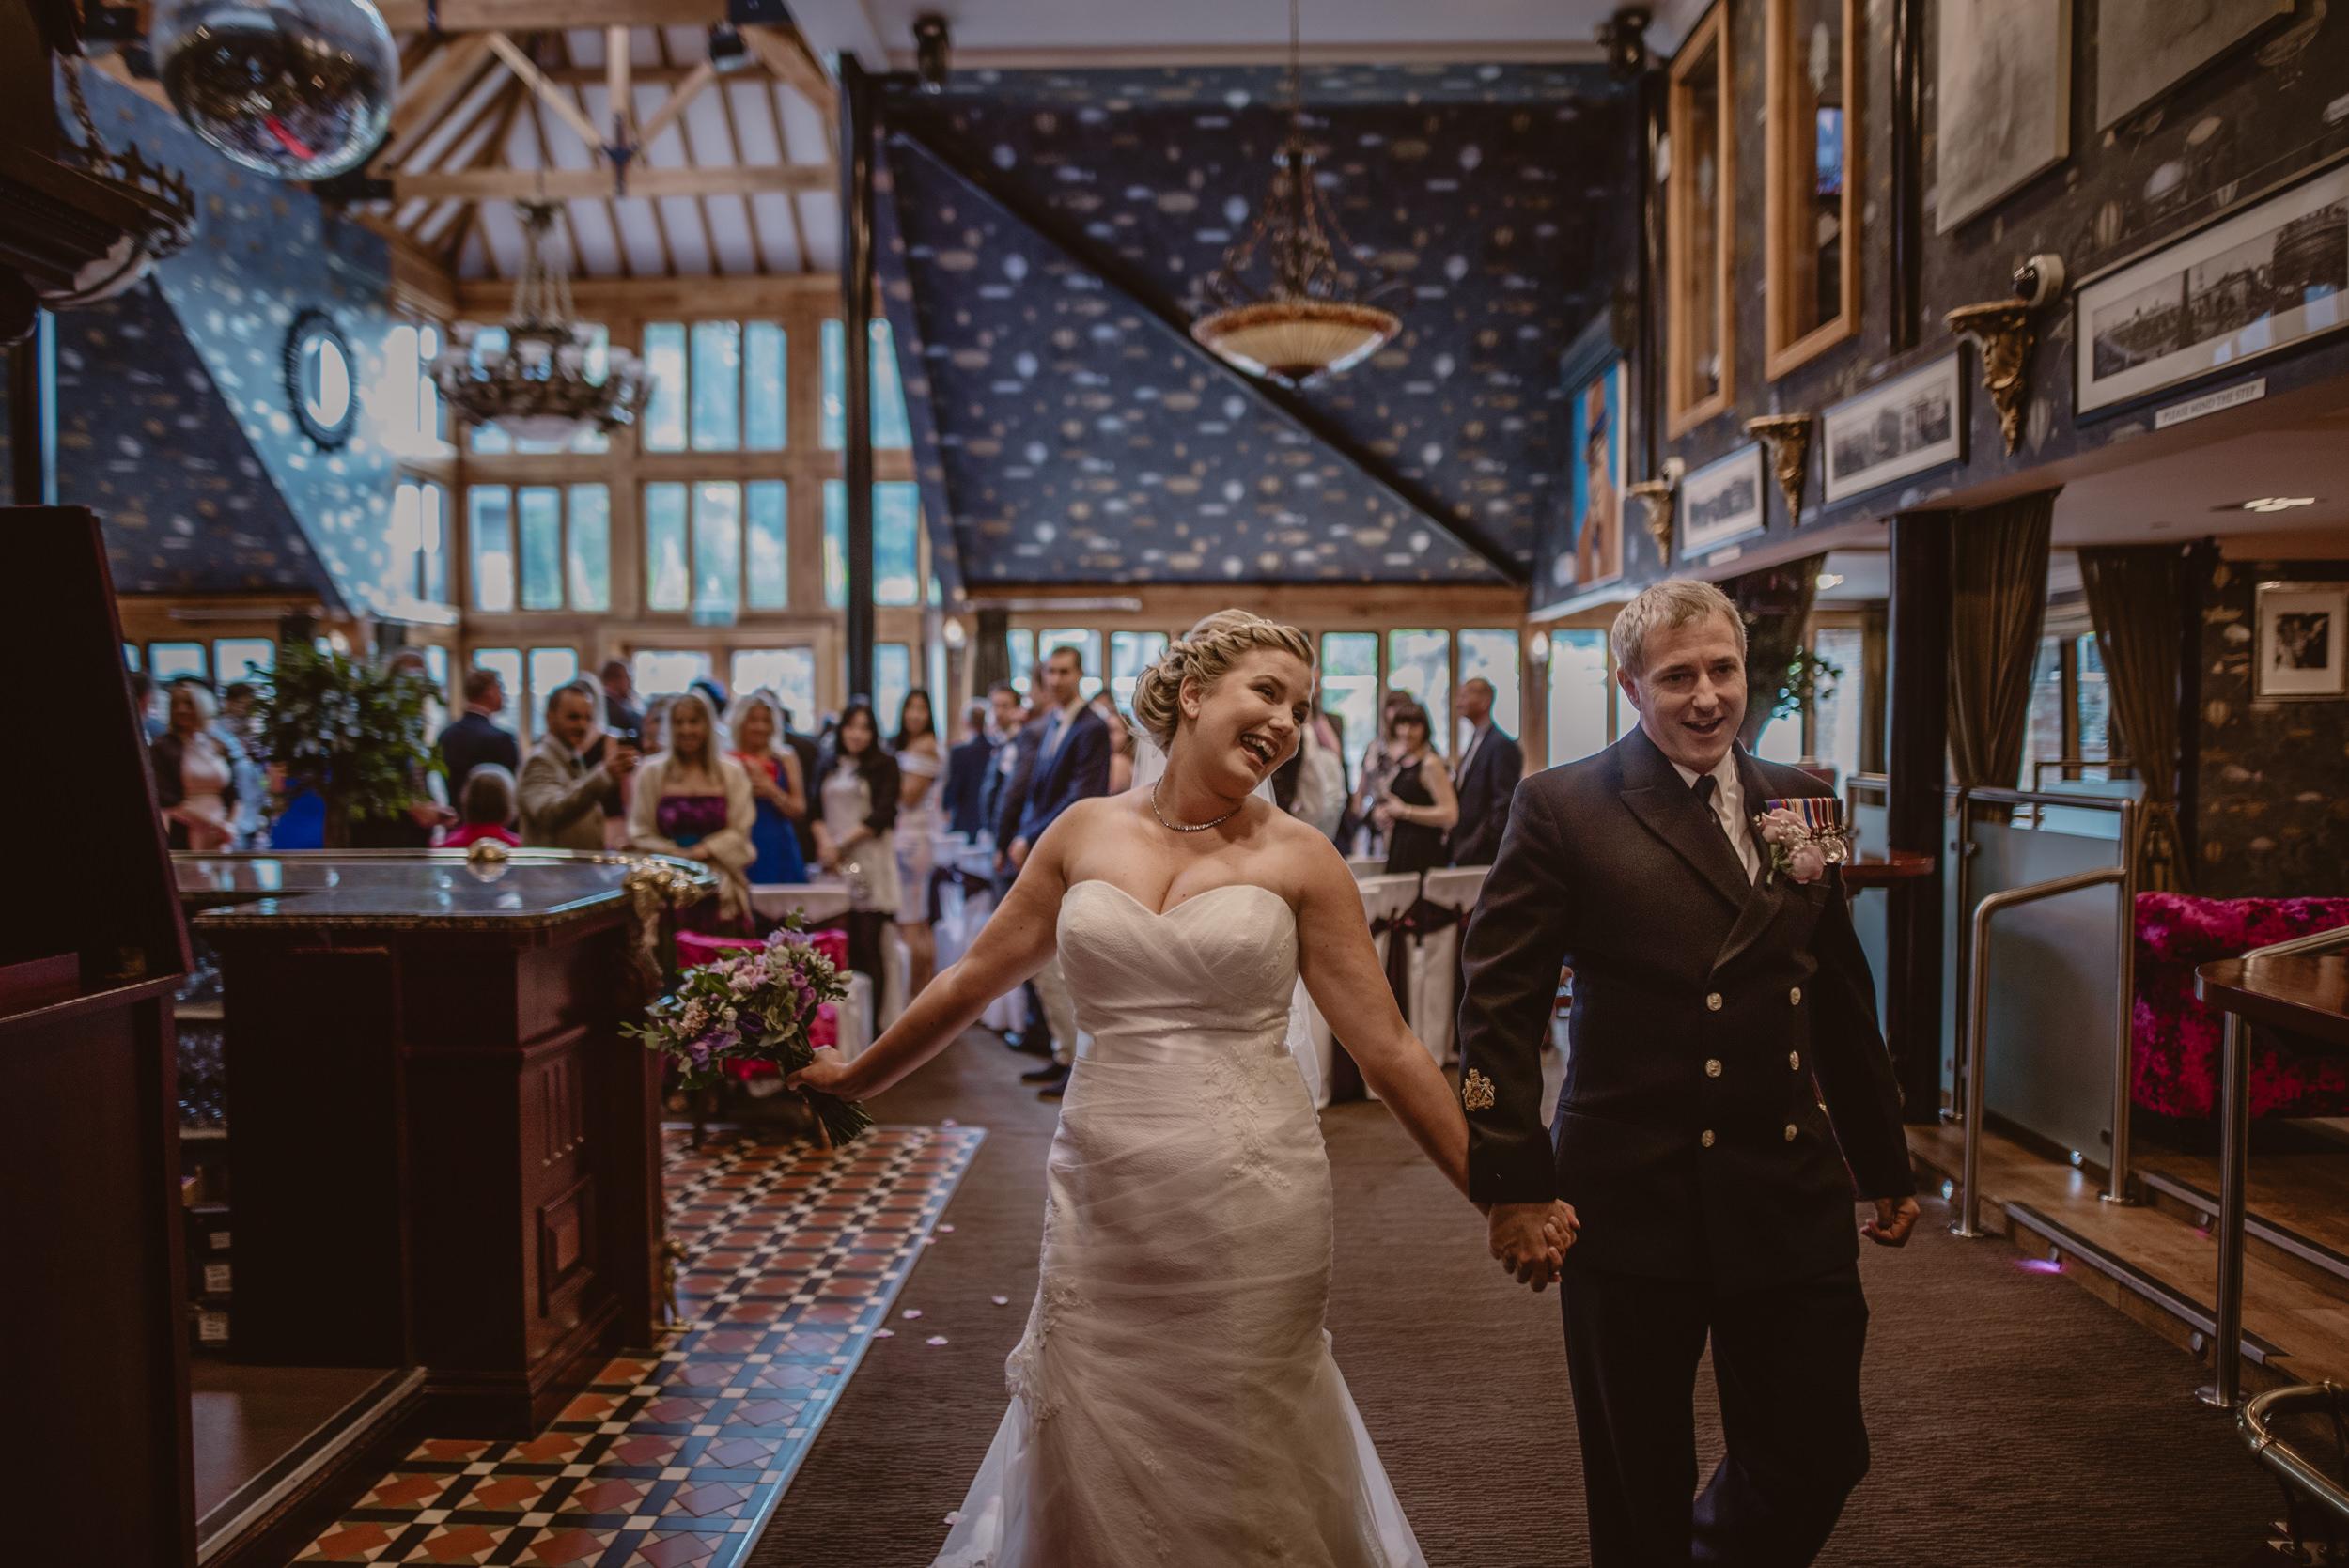 Chantelle-and-Stephen-Old-Thorns-Hotel-Wedding-Liphook-Manu-Mendoza-Wedding-Photography-251.jpg